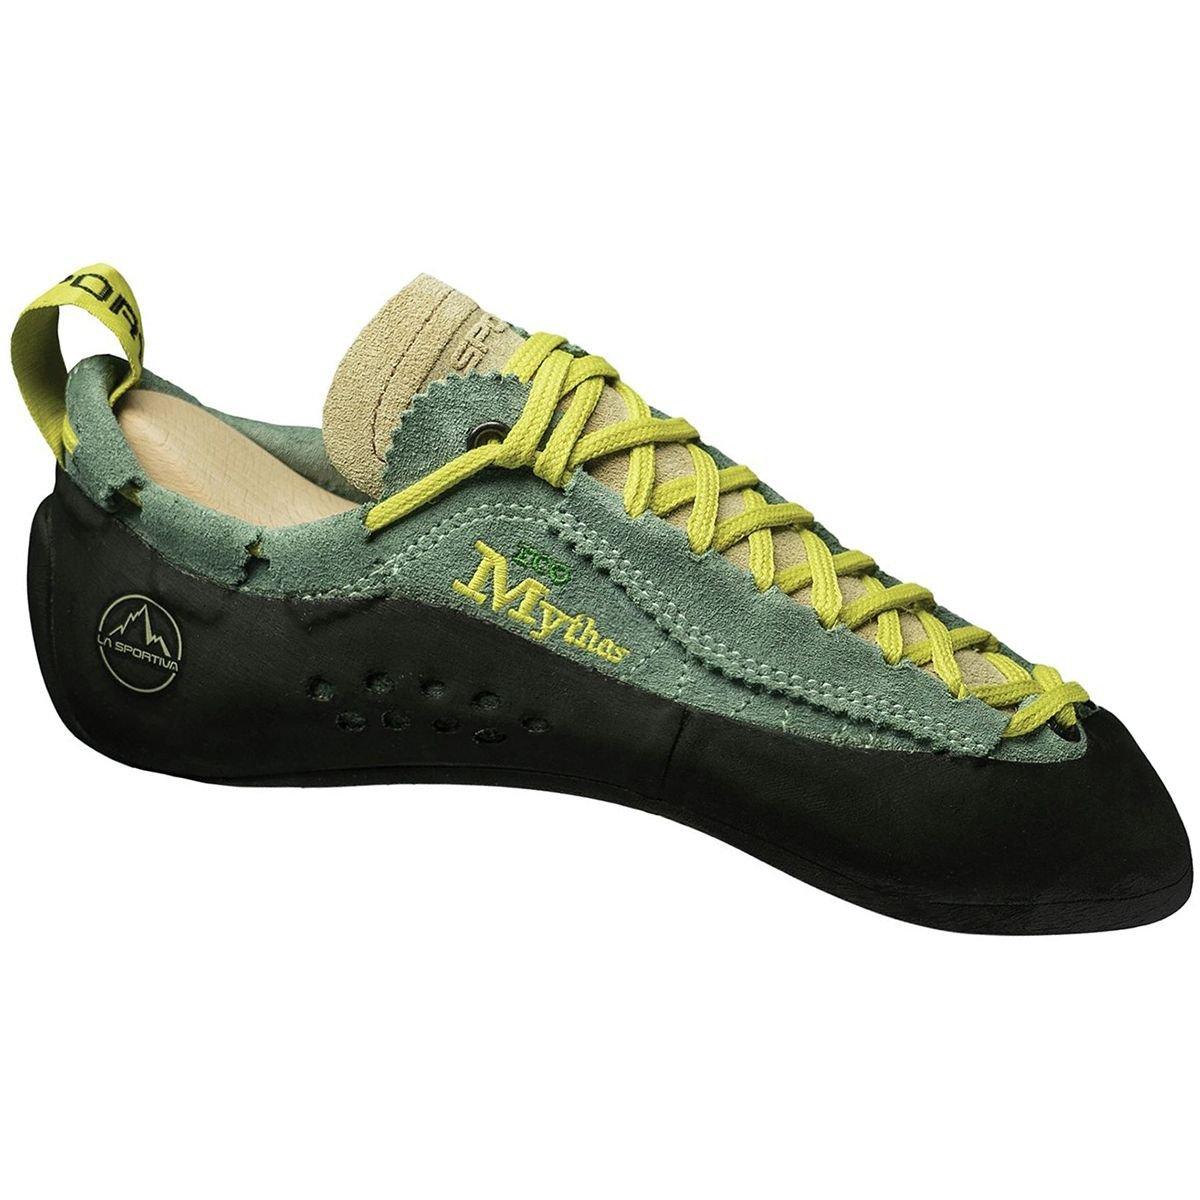 La Sportiva Mythos Eco Climbing Shoe - Women's Greenbay 37.5 by La Sportiva (Image #1)